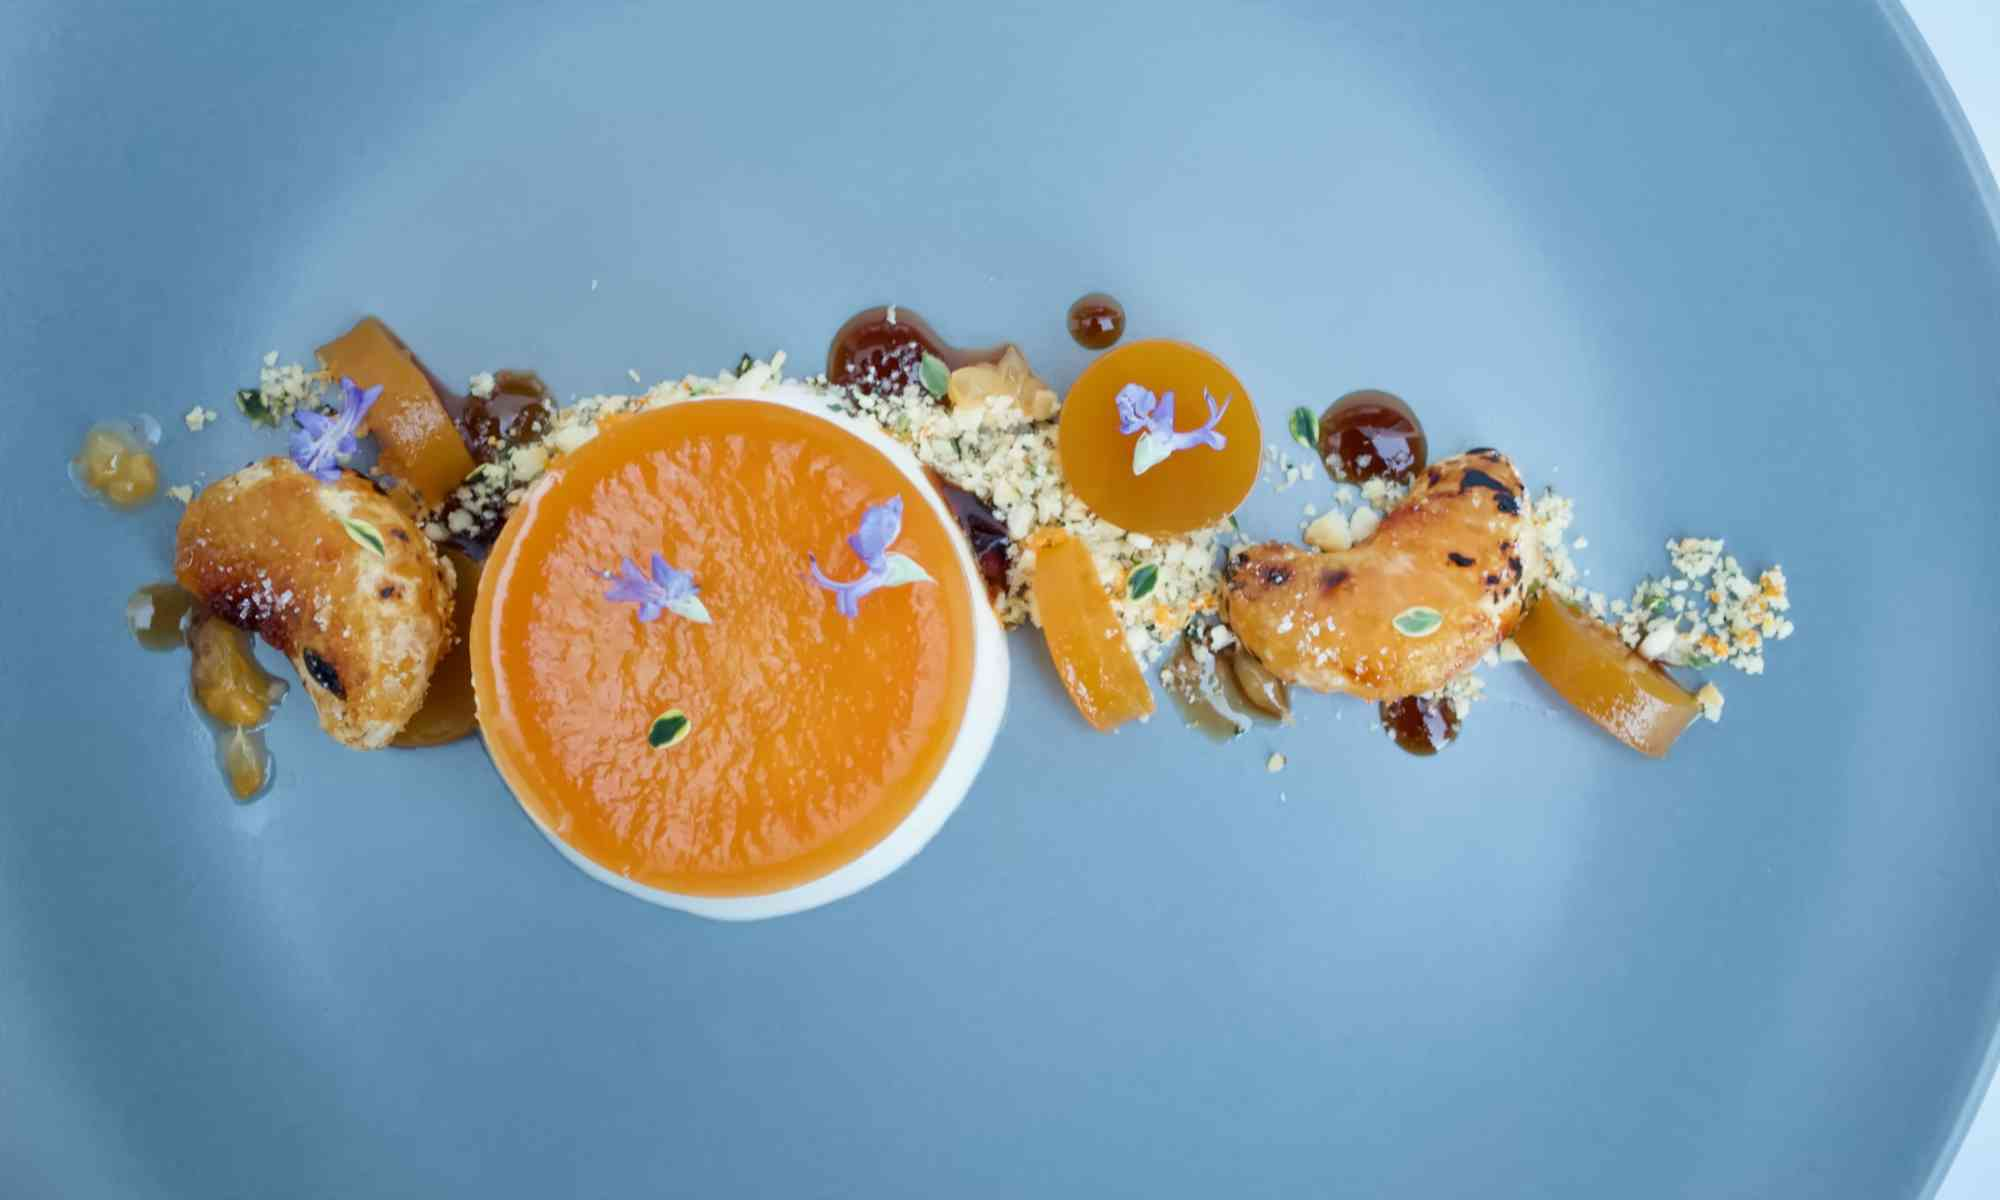 Clementine & Earl Grey tea parfait dessert - Top view - Pollensa Private Chefs